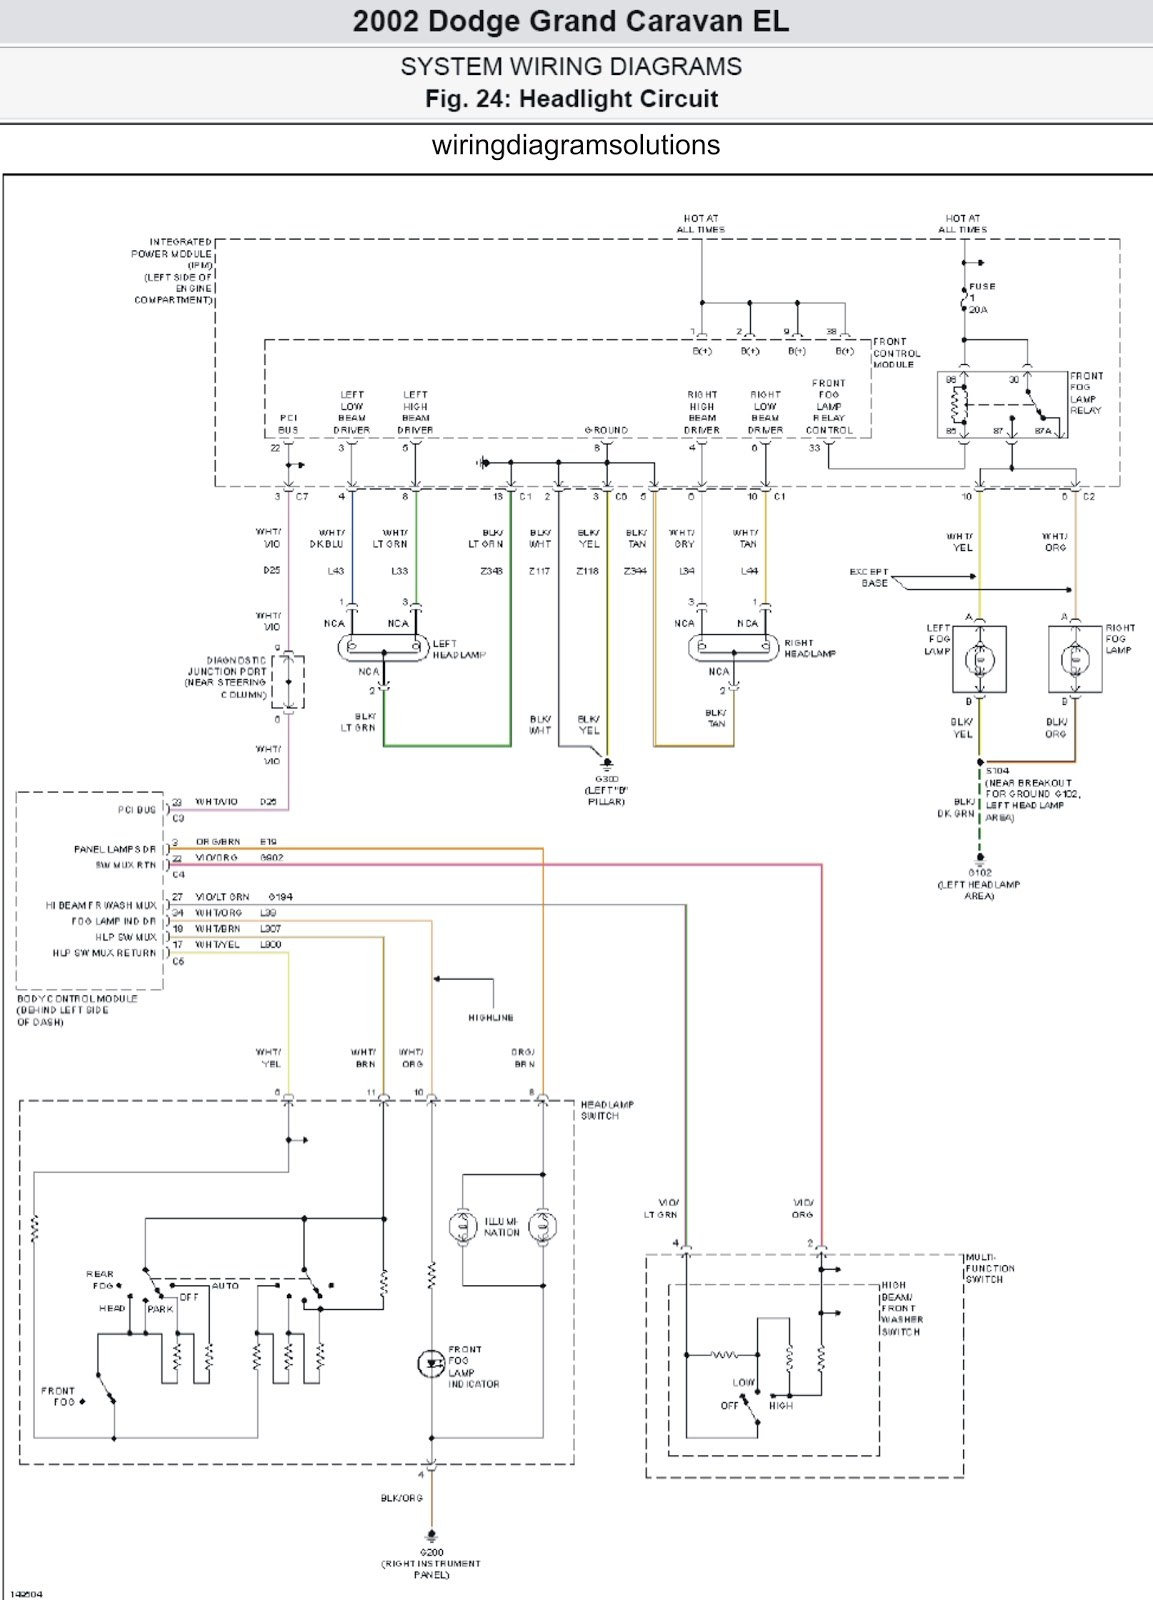 2002 dodge grand caravan el system wiring diagrams 94 silverado fog light wiring diagram 4 pin [ 1153 x 1600 Pixel ]